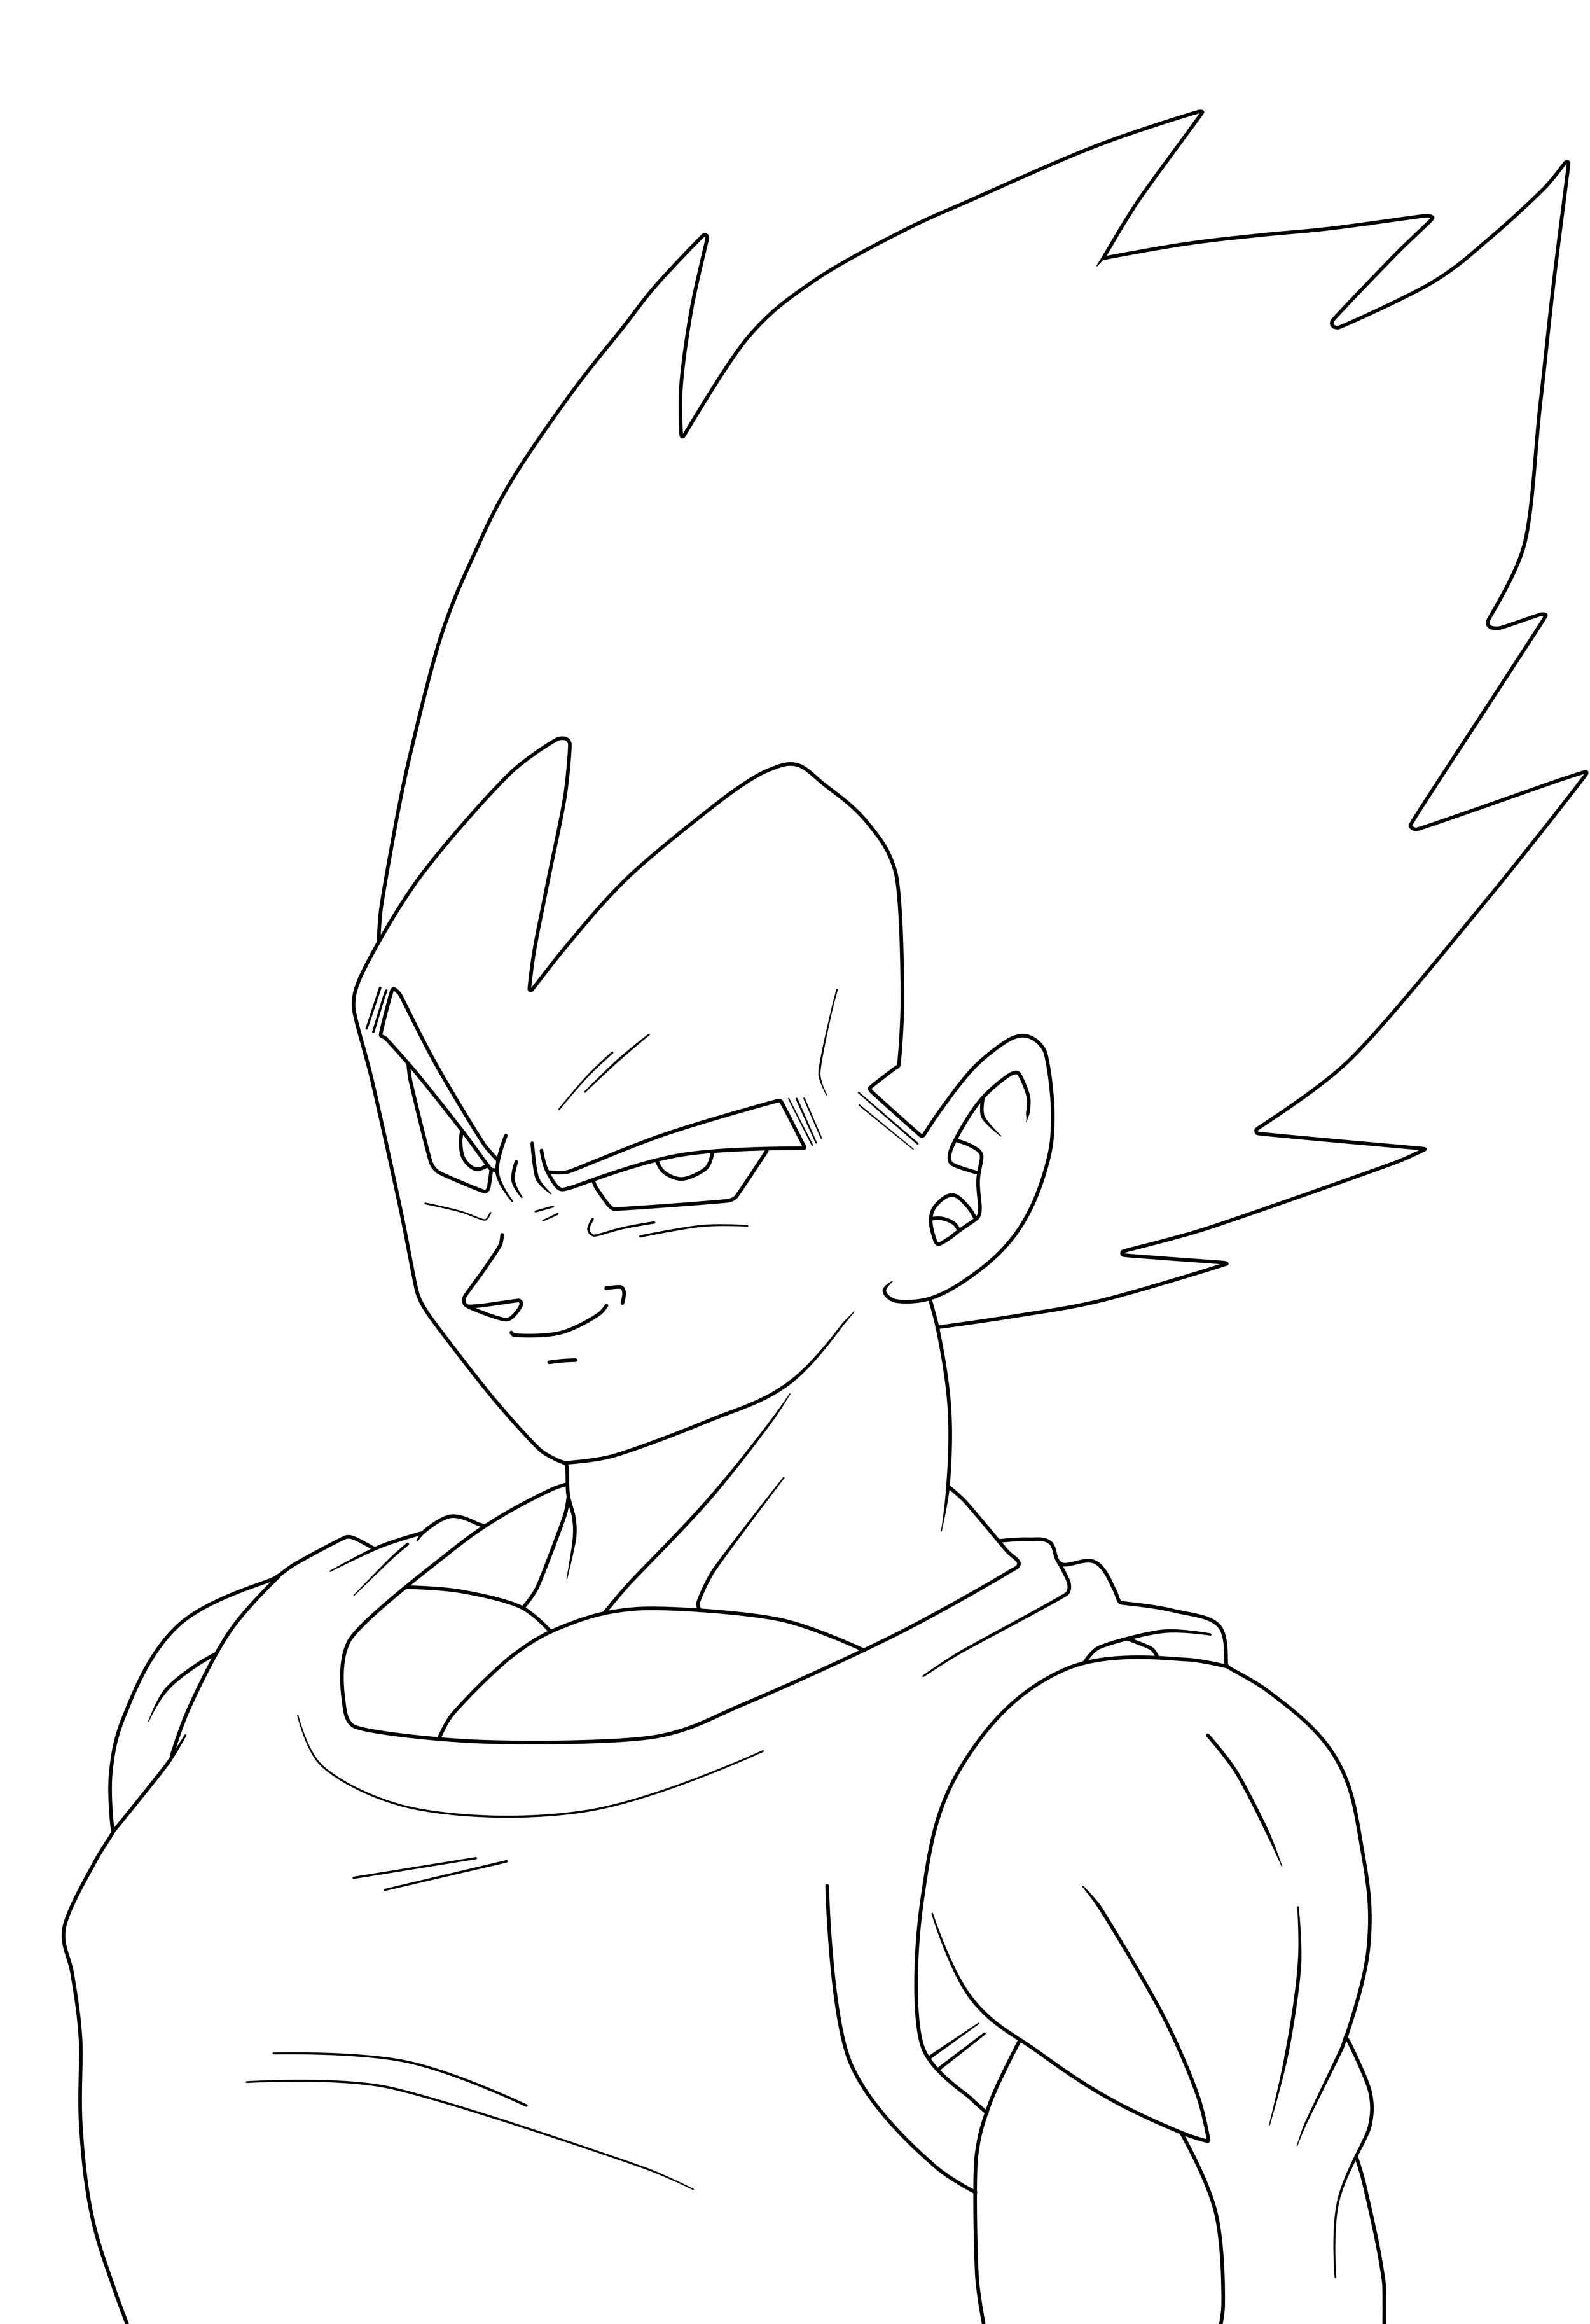 D Line Drawings You Tube : Vegeta majin buu saga lineart by simigot on deviantart